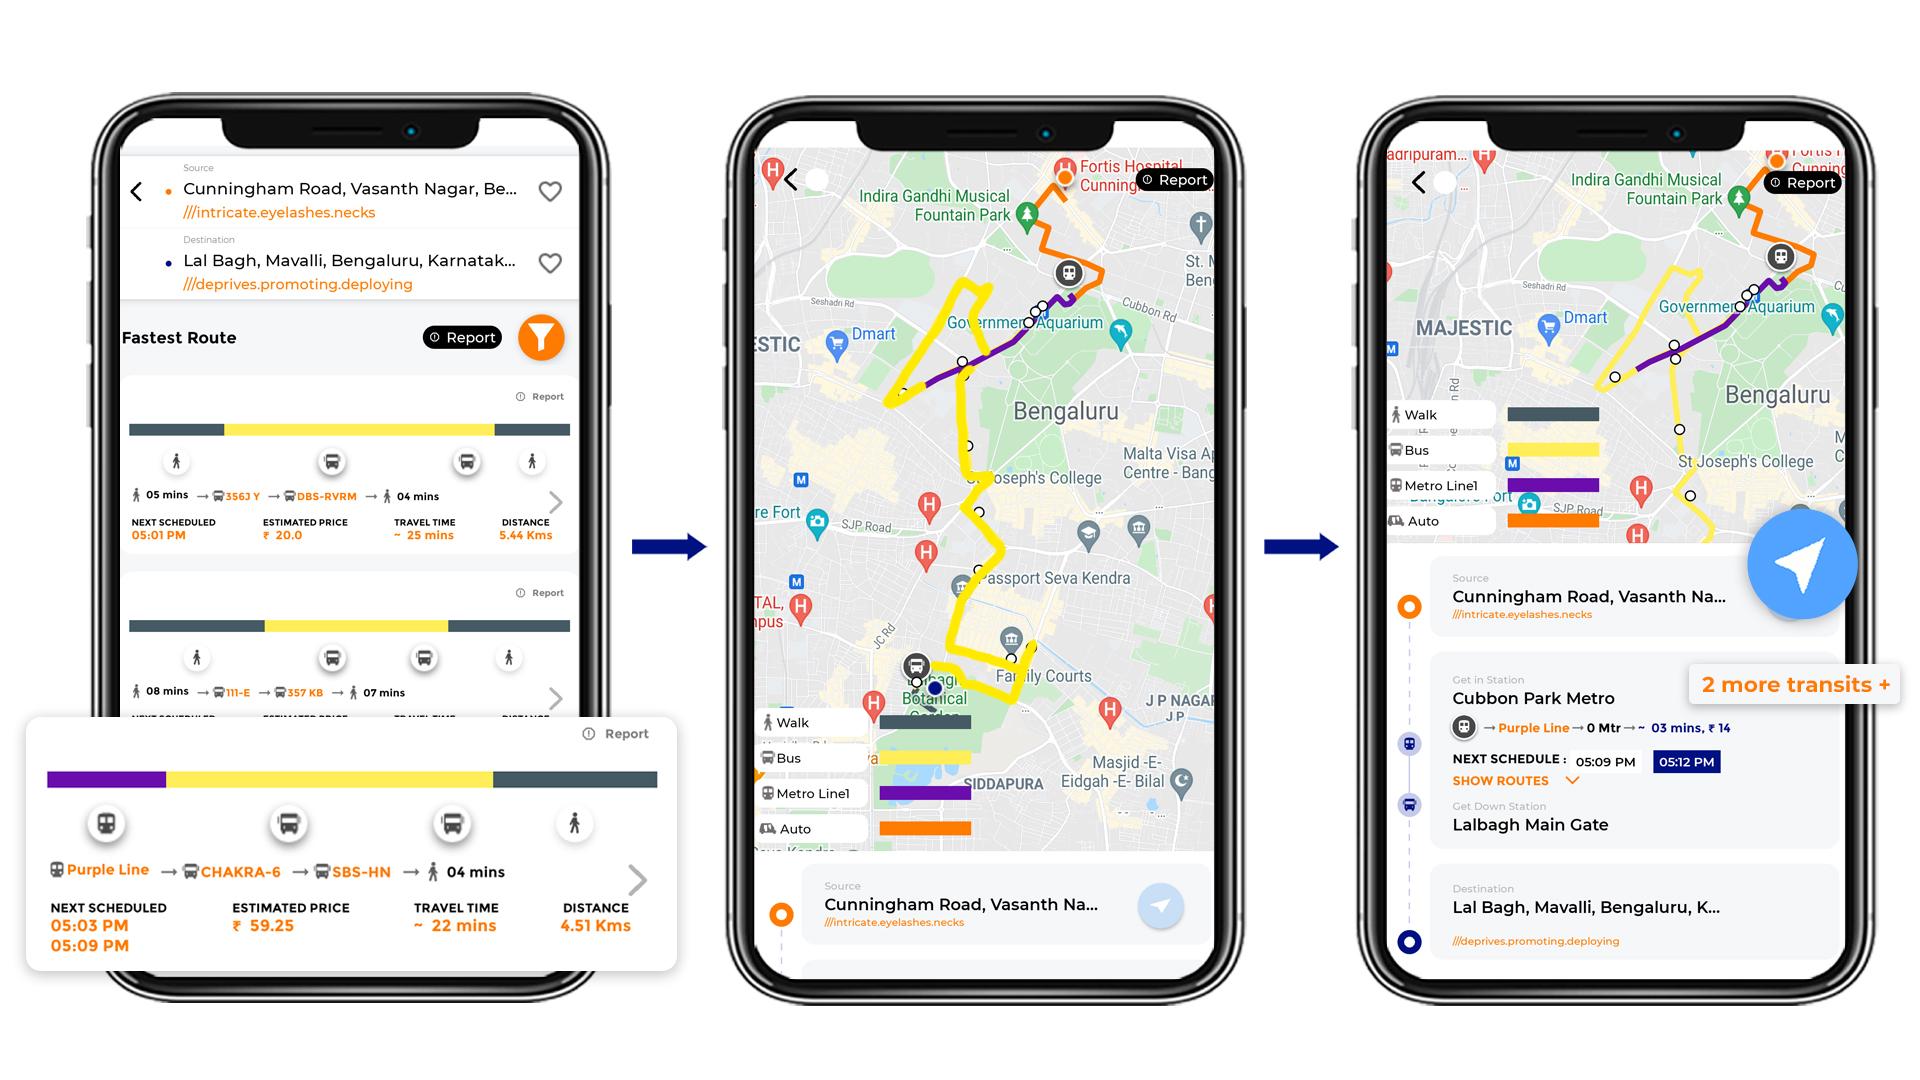 Tummoc, Tummoc app, Public transport,Lal Bagh, Cunningham Road